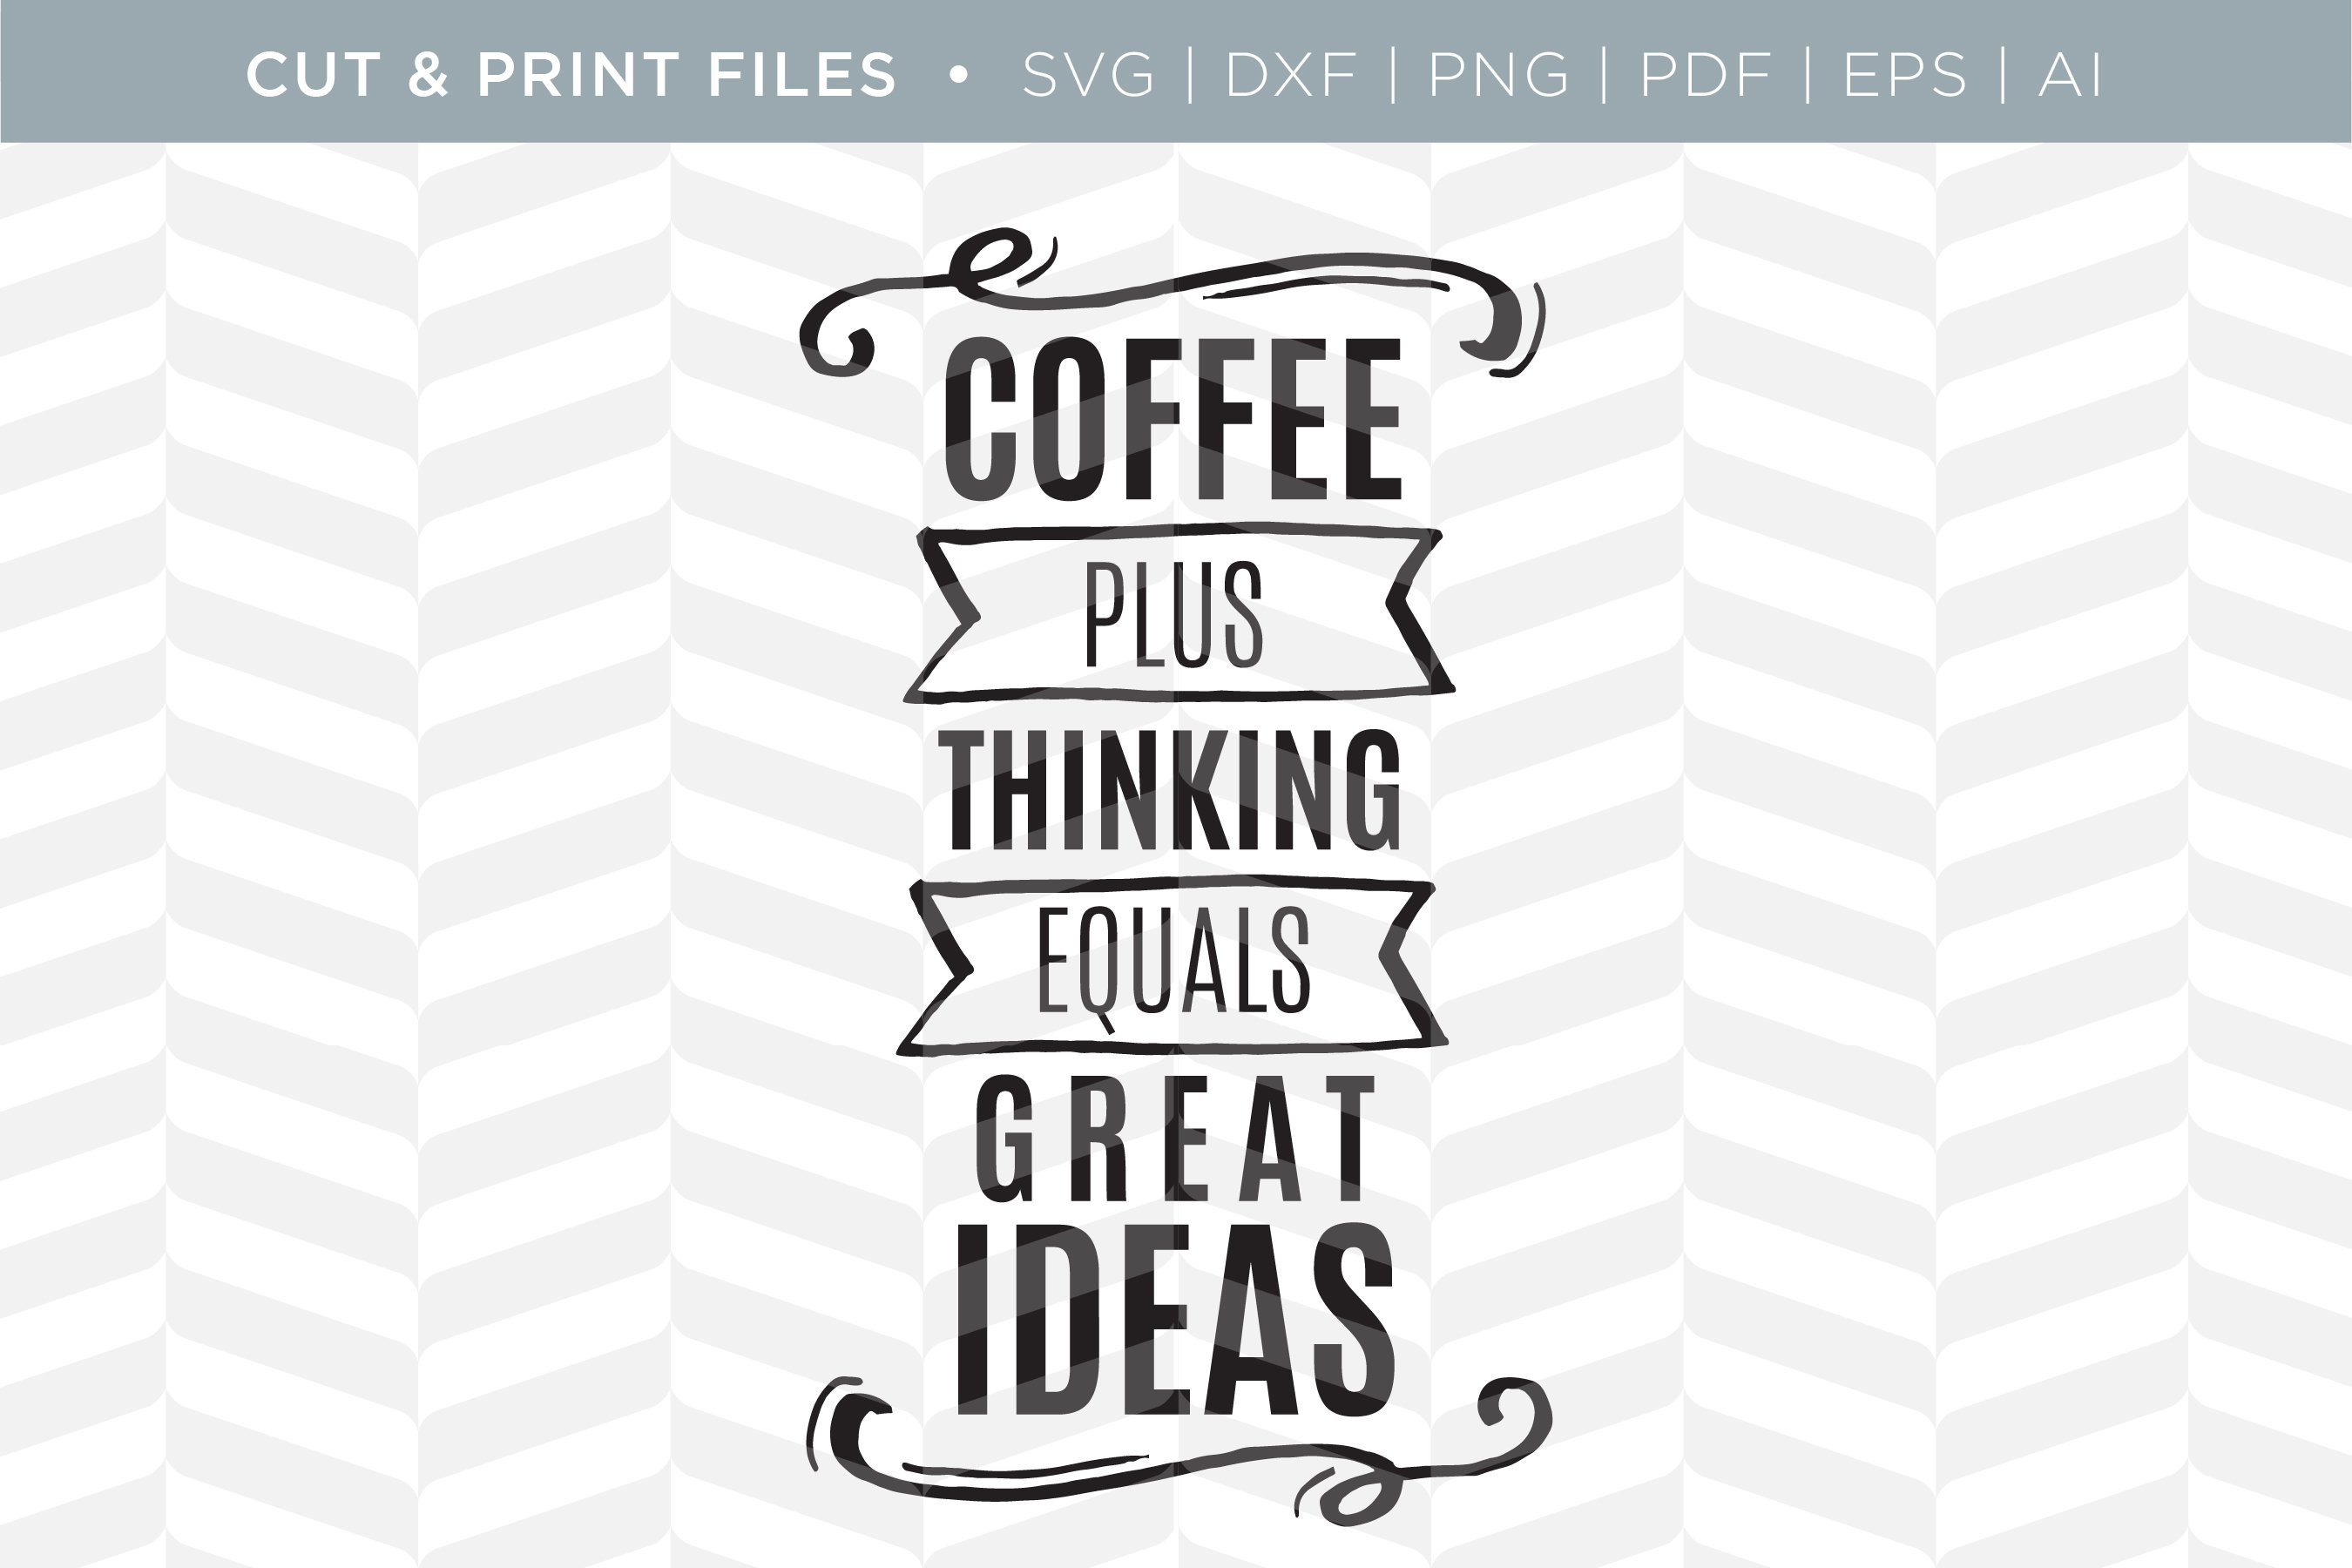 Coffee Svg Cut Print Files Pre Designed Illustrator Graphics Creative Market